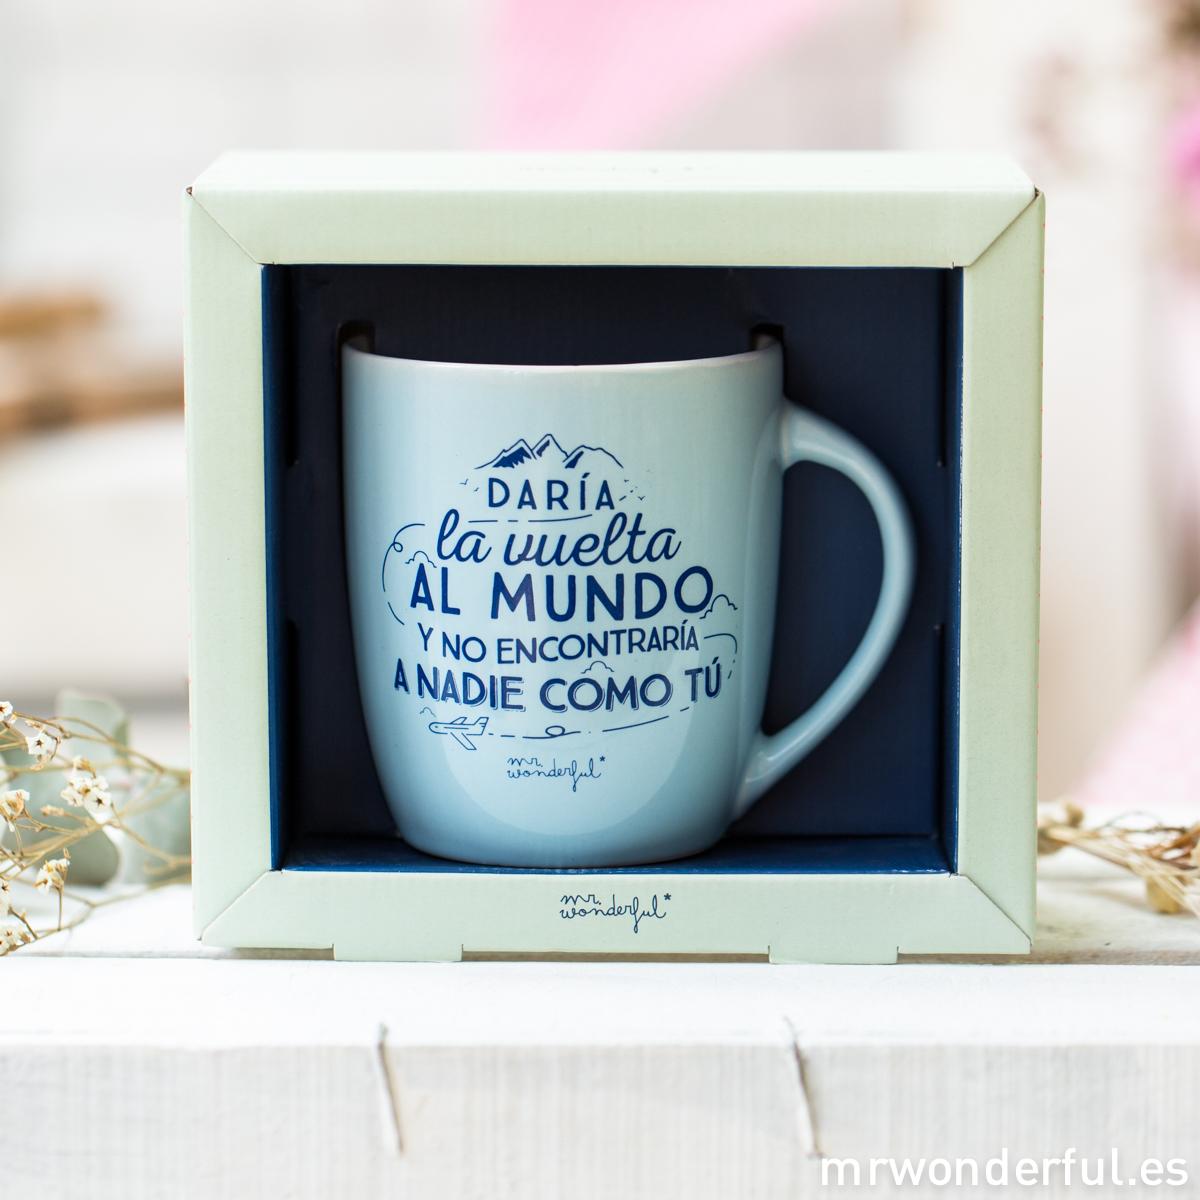 mrwonderful_8436547191642_WON-210_TAZA_Taza-pastel-AZUL_daria-la-vuelta-al-mundo-no-encontraria-nadie-como-tu-32